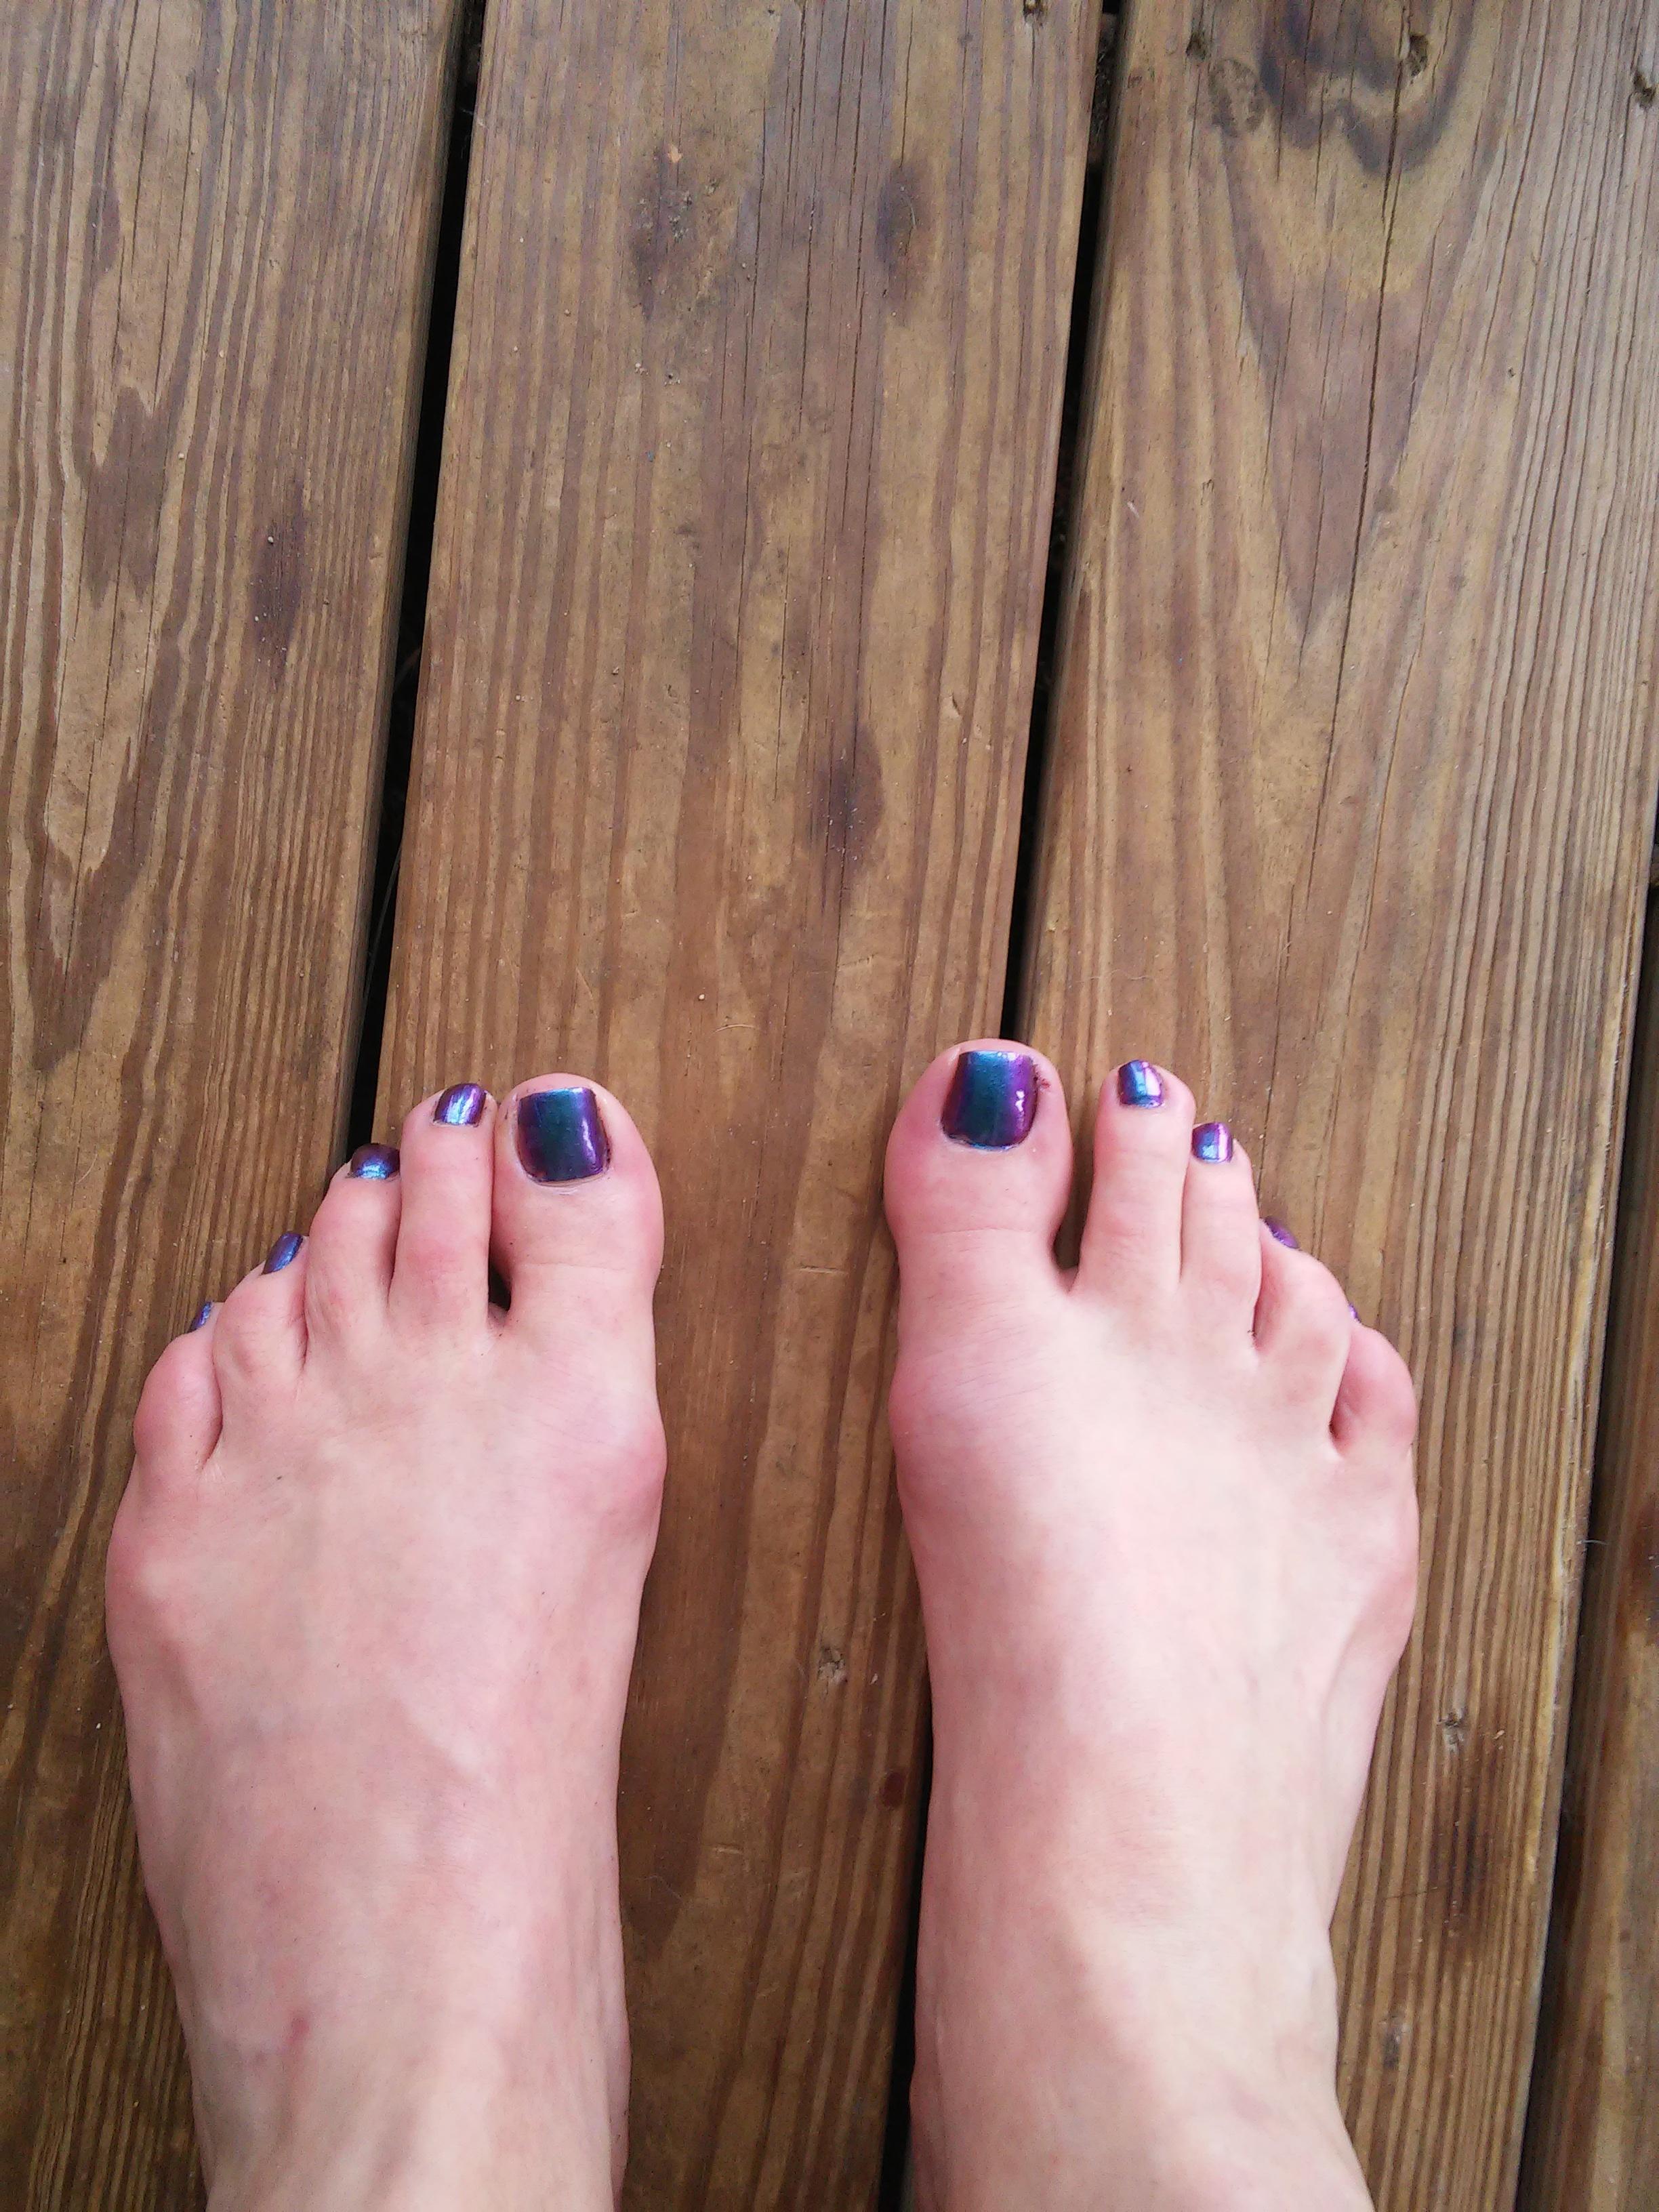 Do toenails their why paint guys Why Do